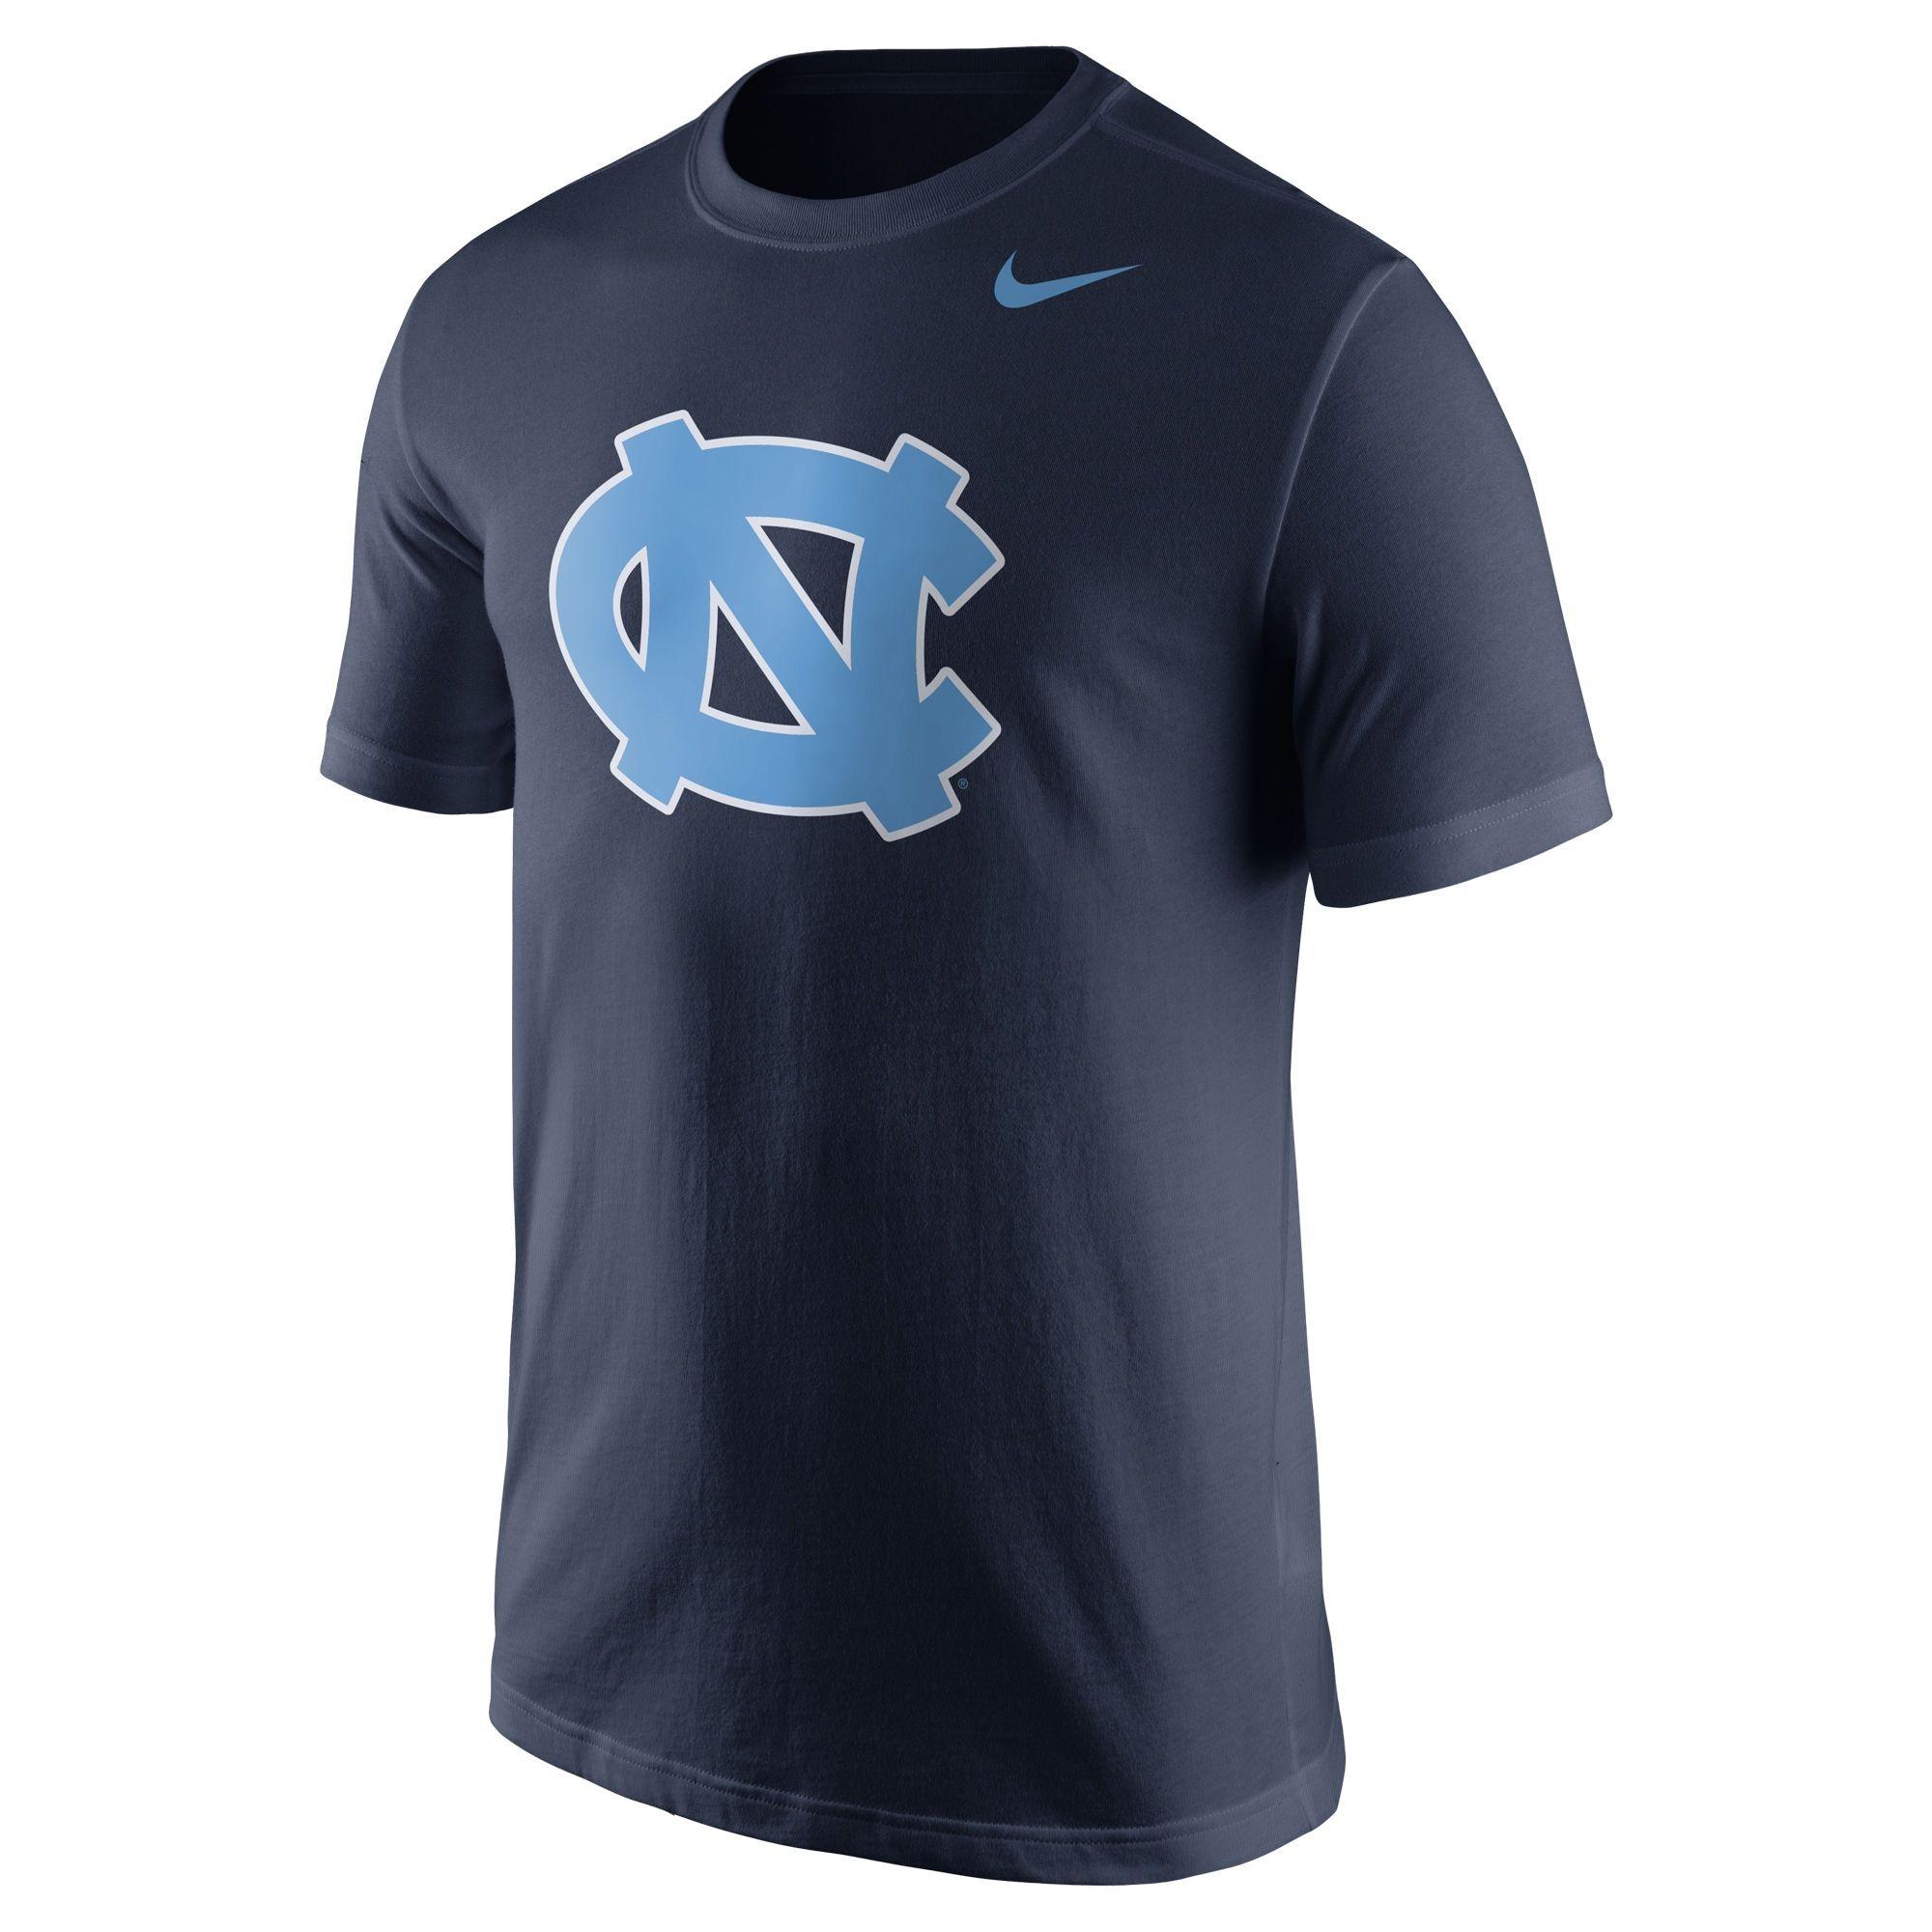 Nike North Carolina Tar Heels Navy Blue Logo T Shirt North